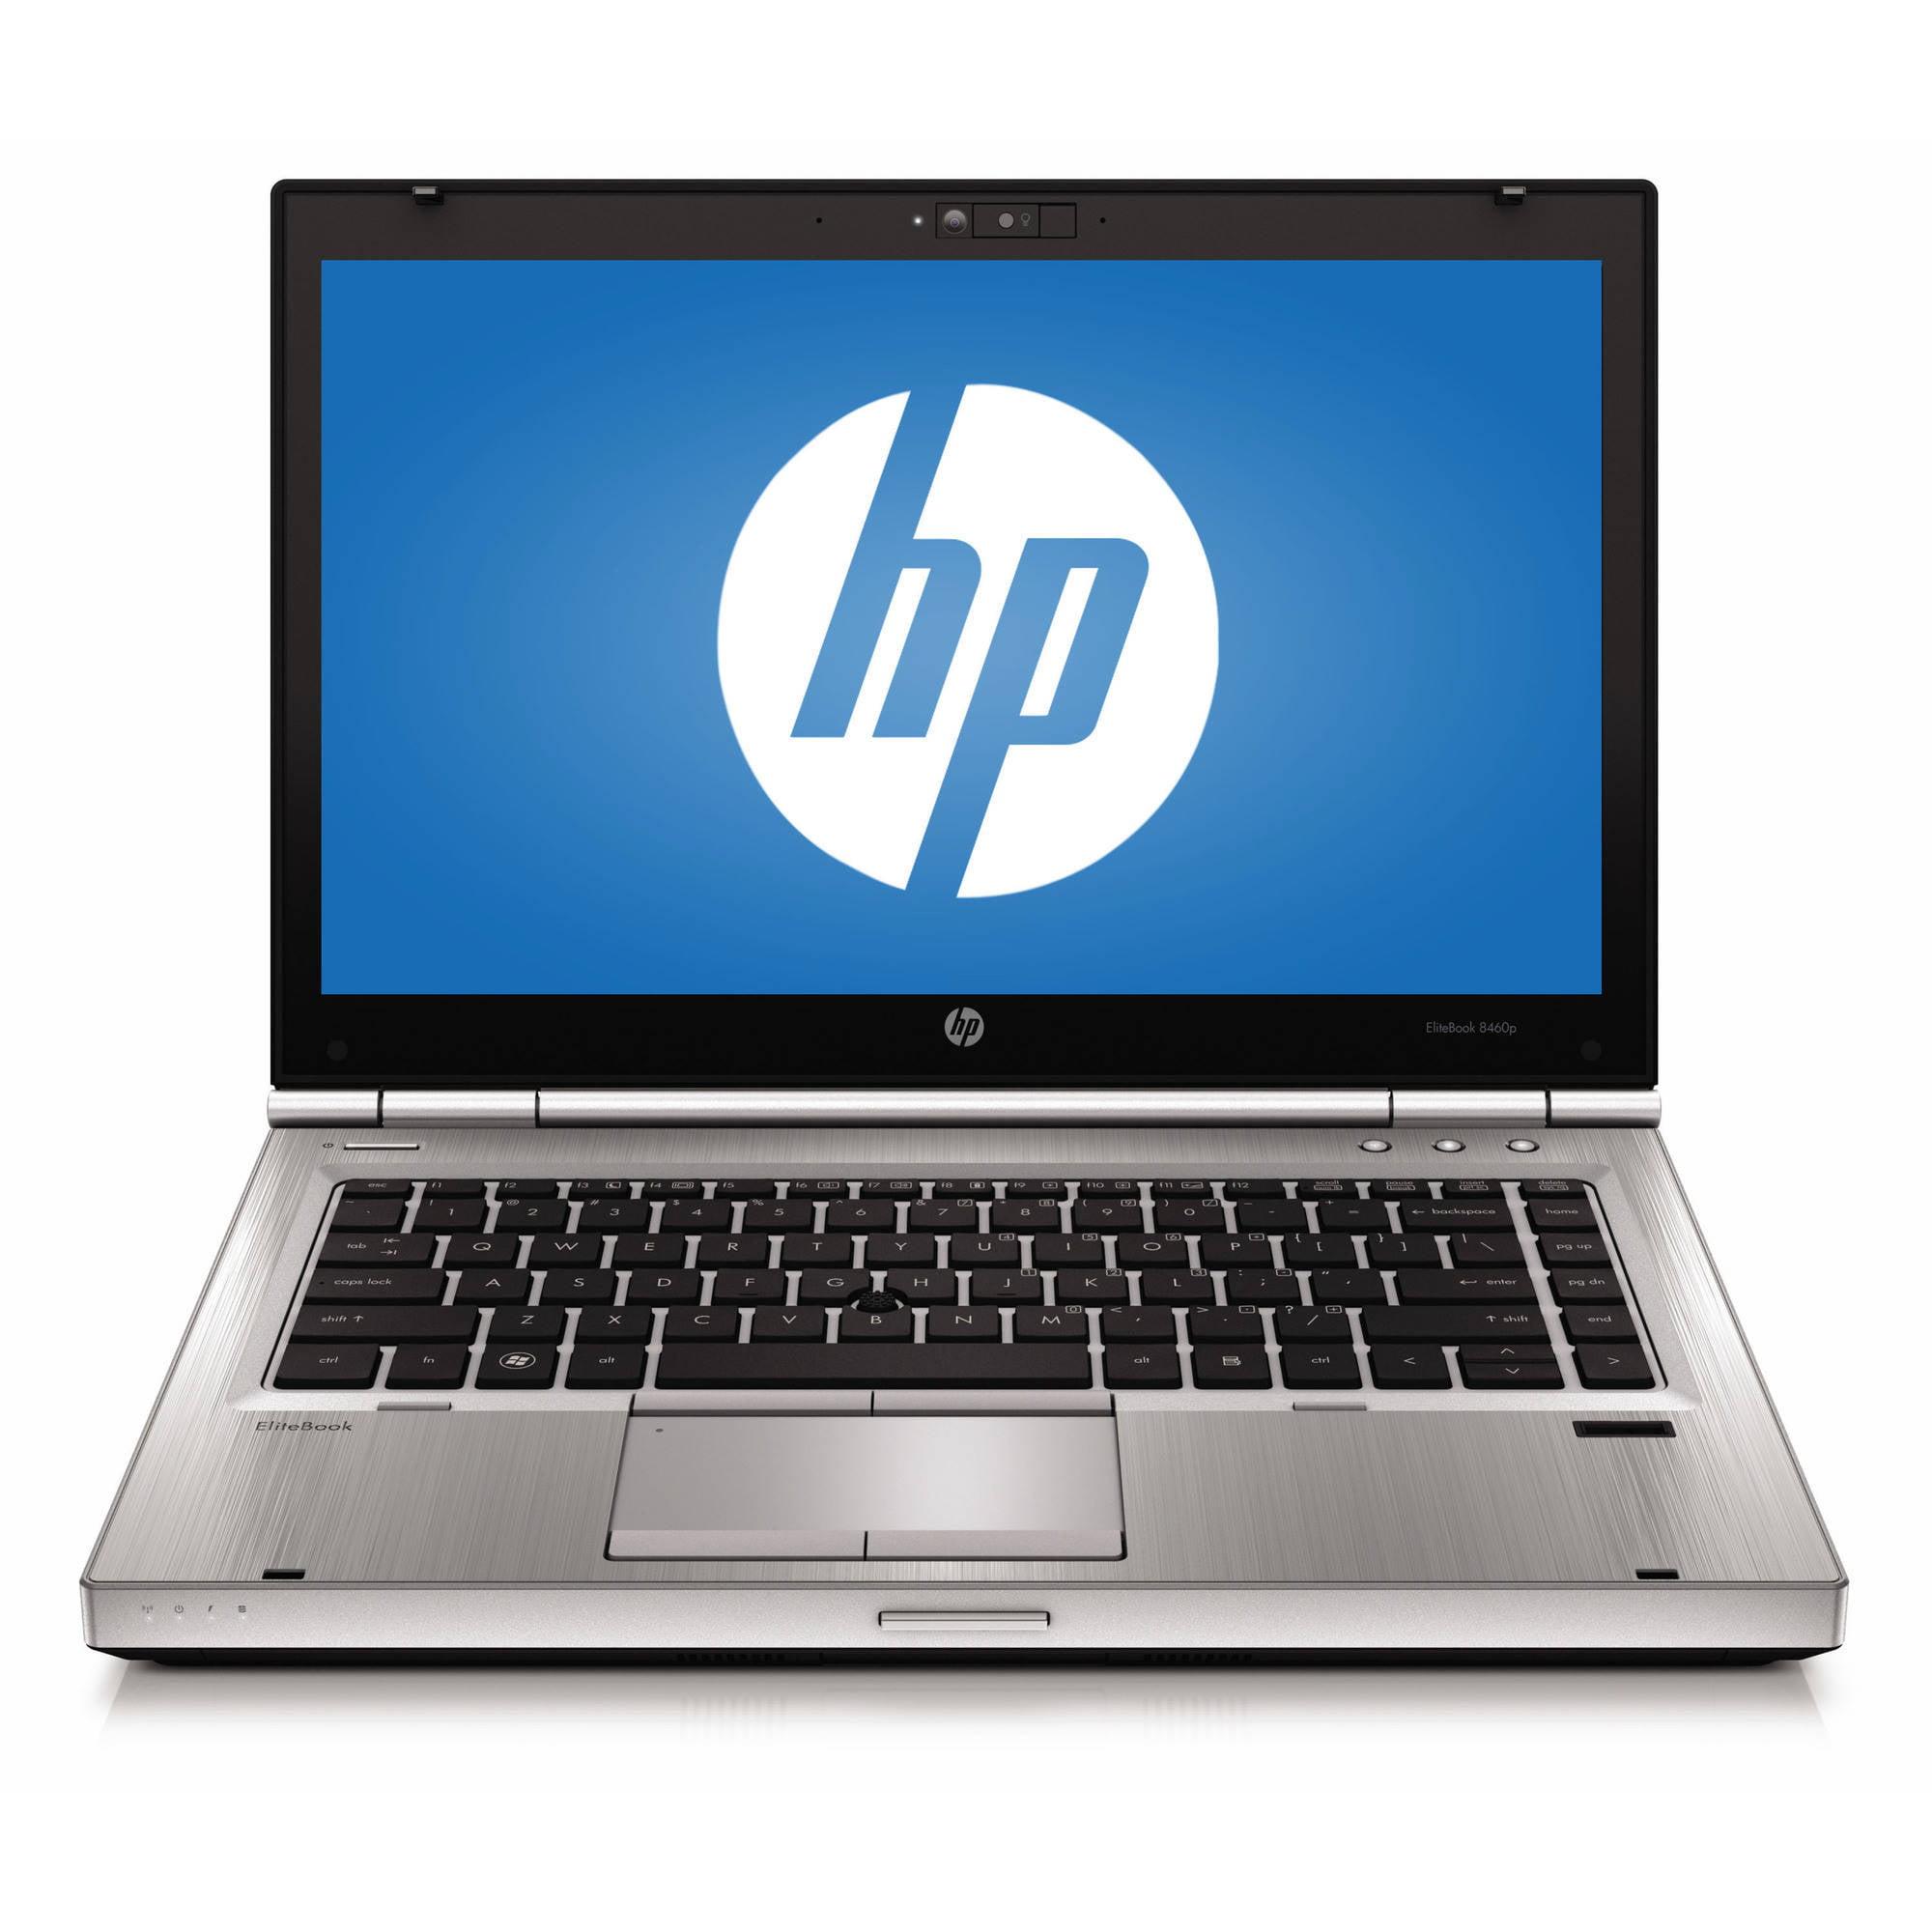 "Refurbished HP EliteBook 8460P 14"" Laptop, Windows 10 Pro, Intel Core i5-2520M Processor, 4GB RAM, 320GB Hard Drive"